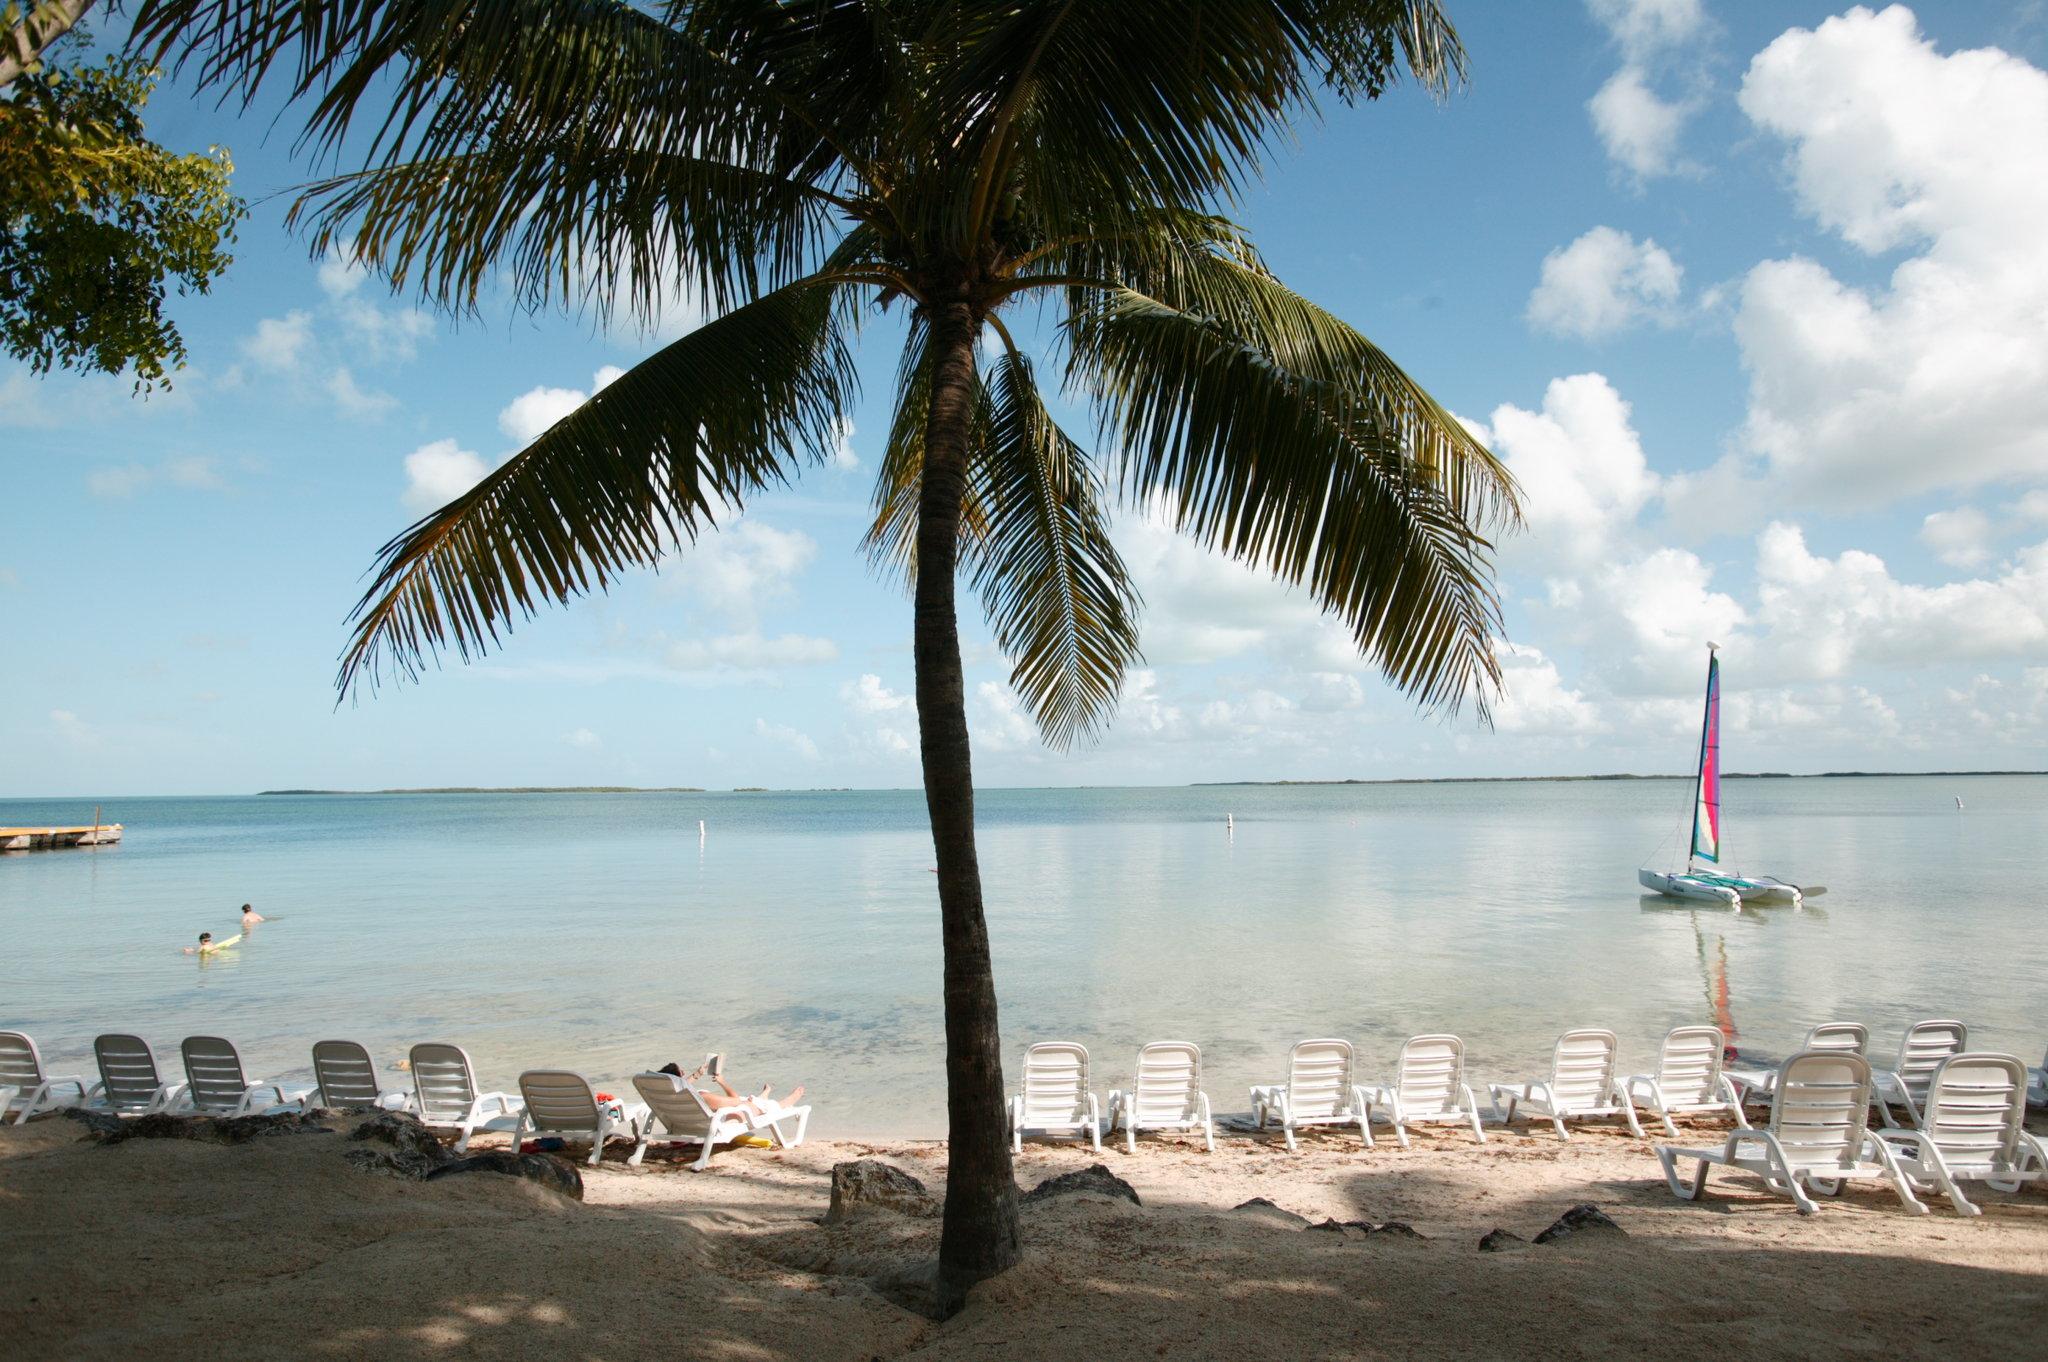 Hilton Key Largo Resort - Key Largo